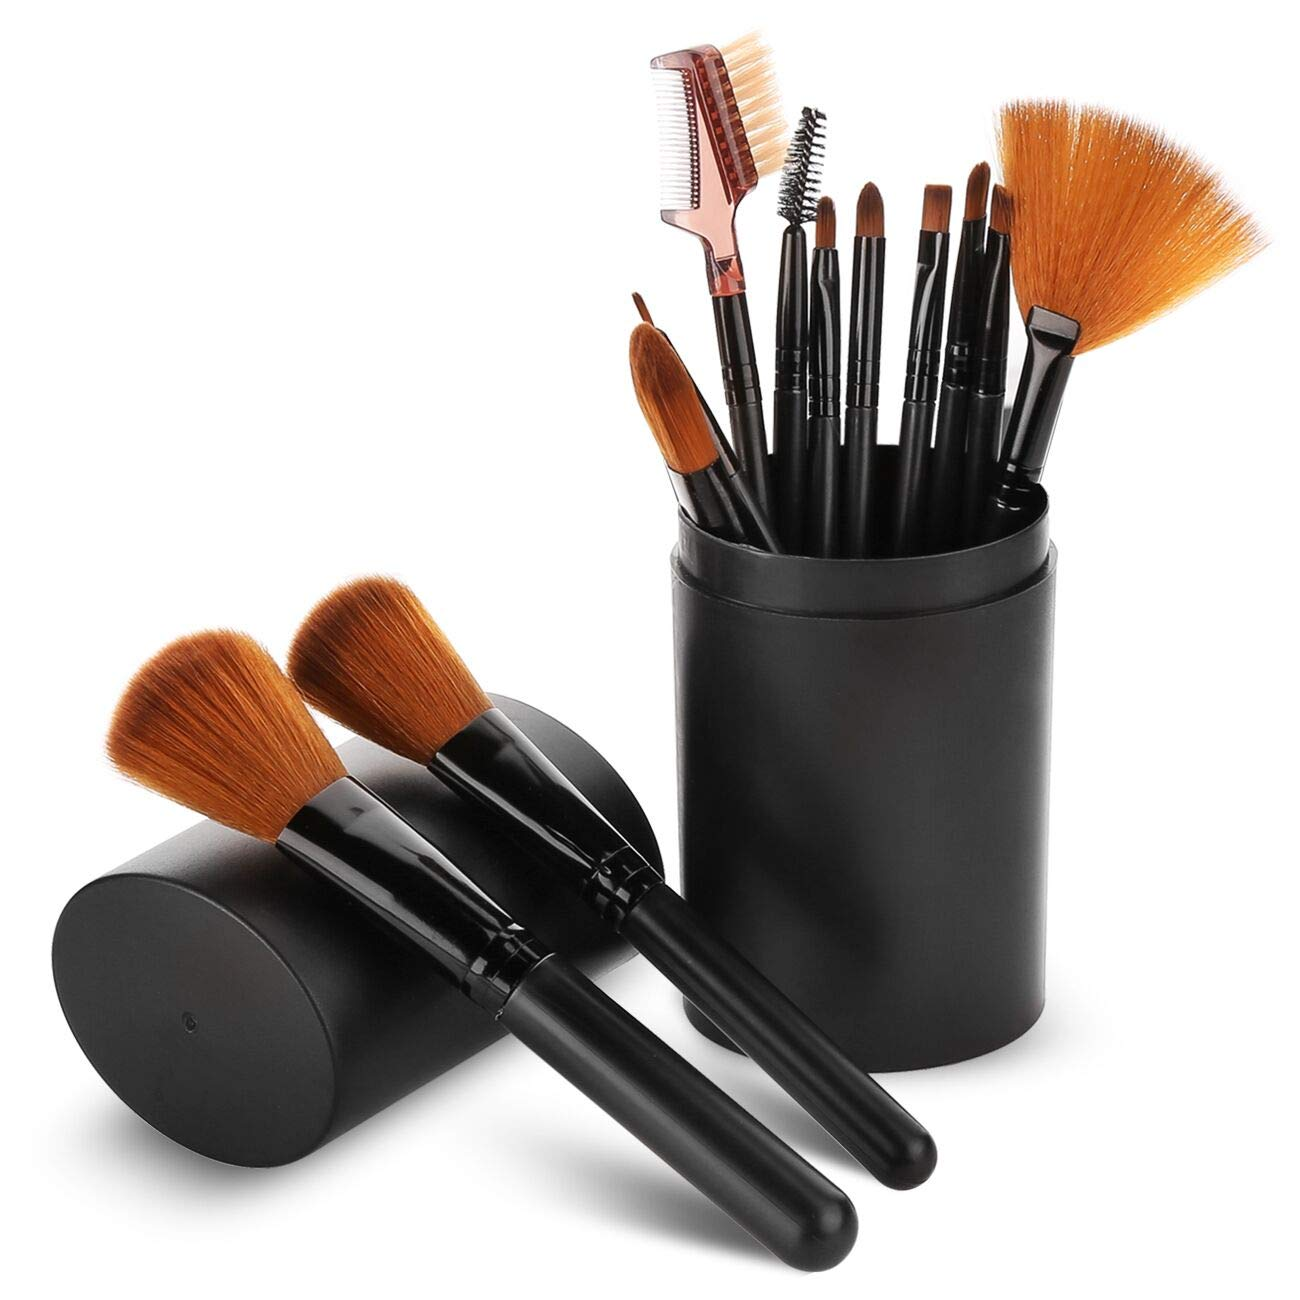 Makeup Brush Sets - 12 Pcs Makeup Brushes with Case Best for Foundation Eyeshadow Eyebrow Eyeliner Blush Powder Concealer Contour